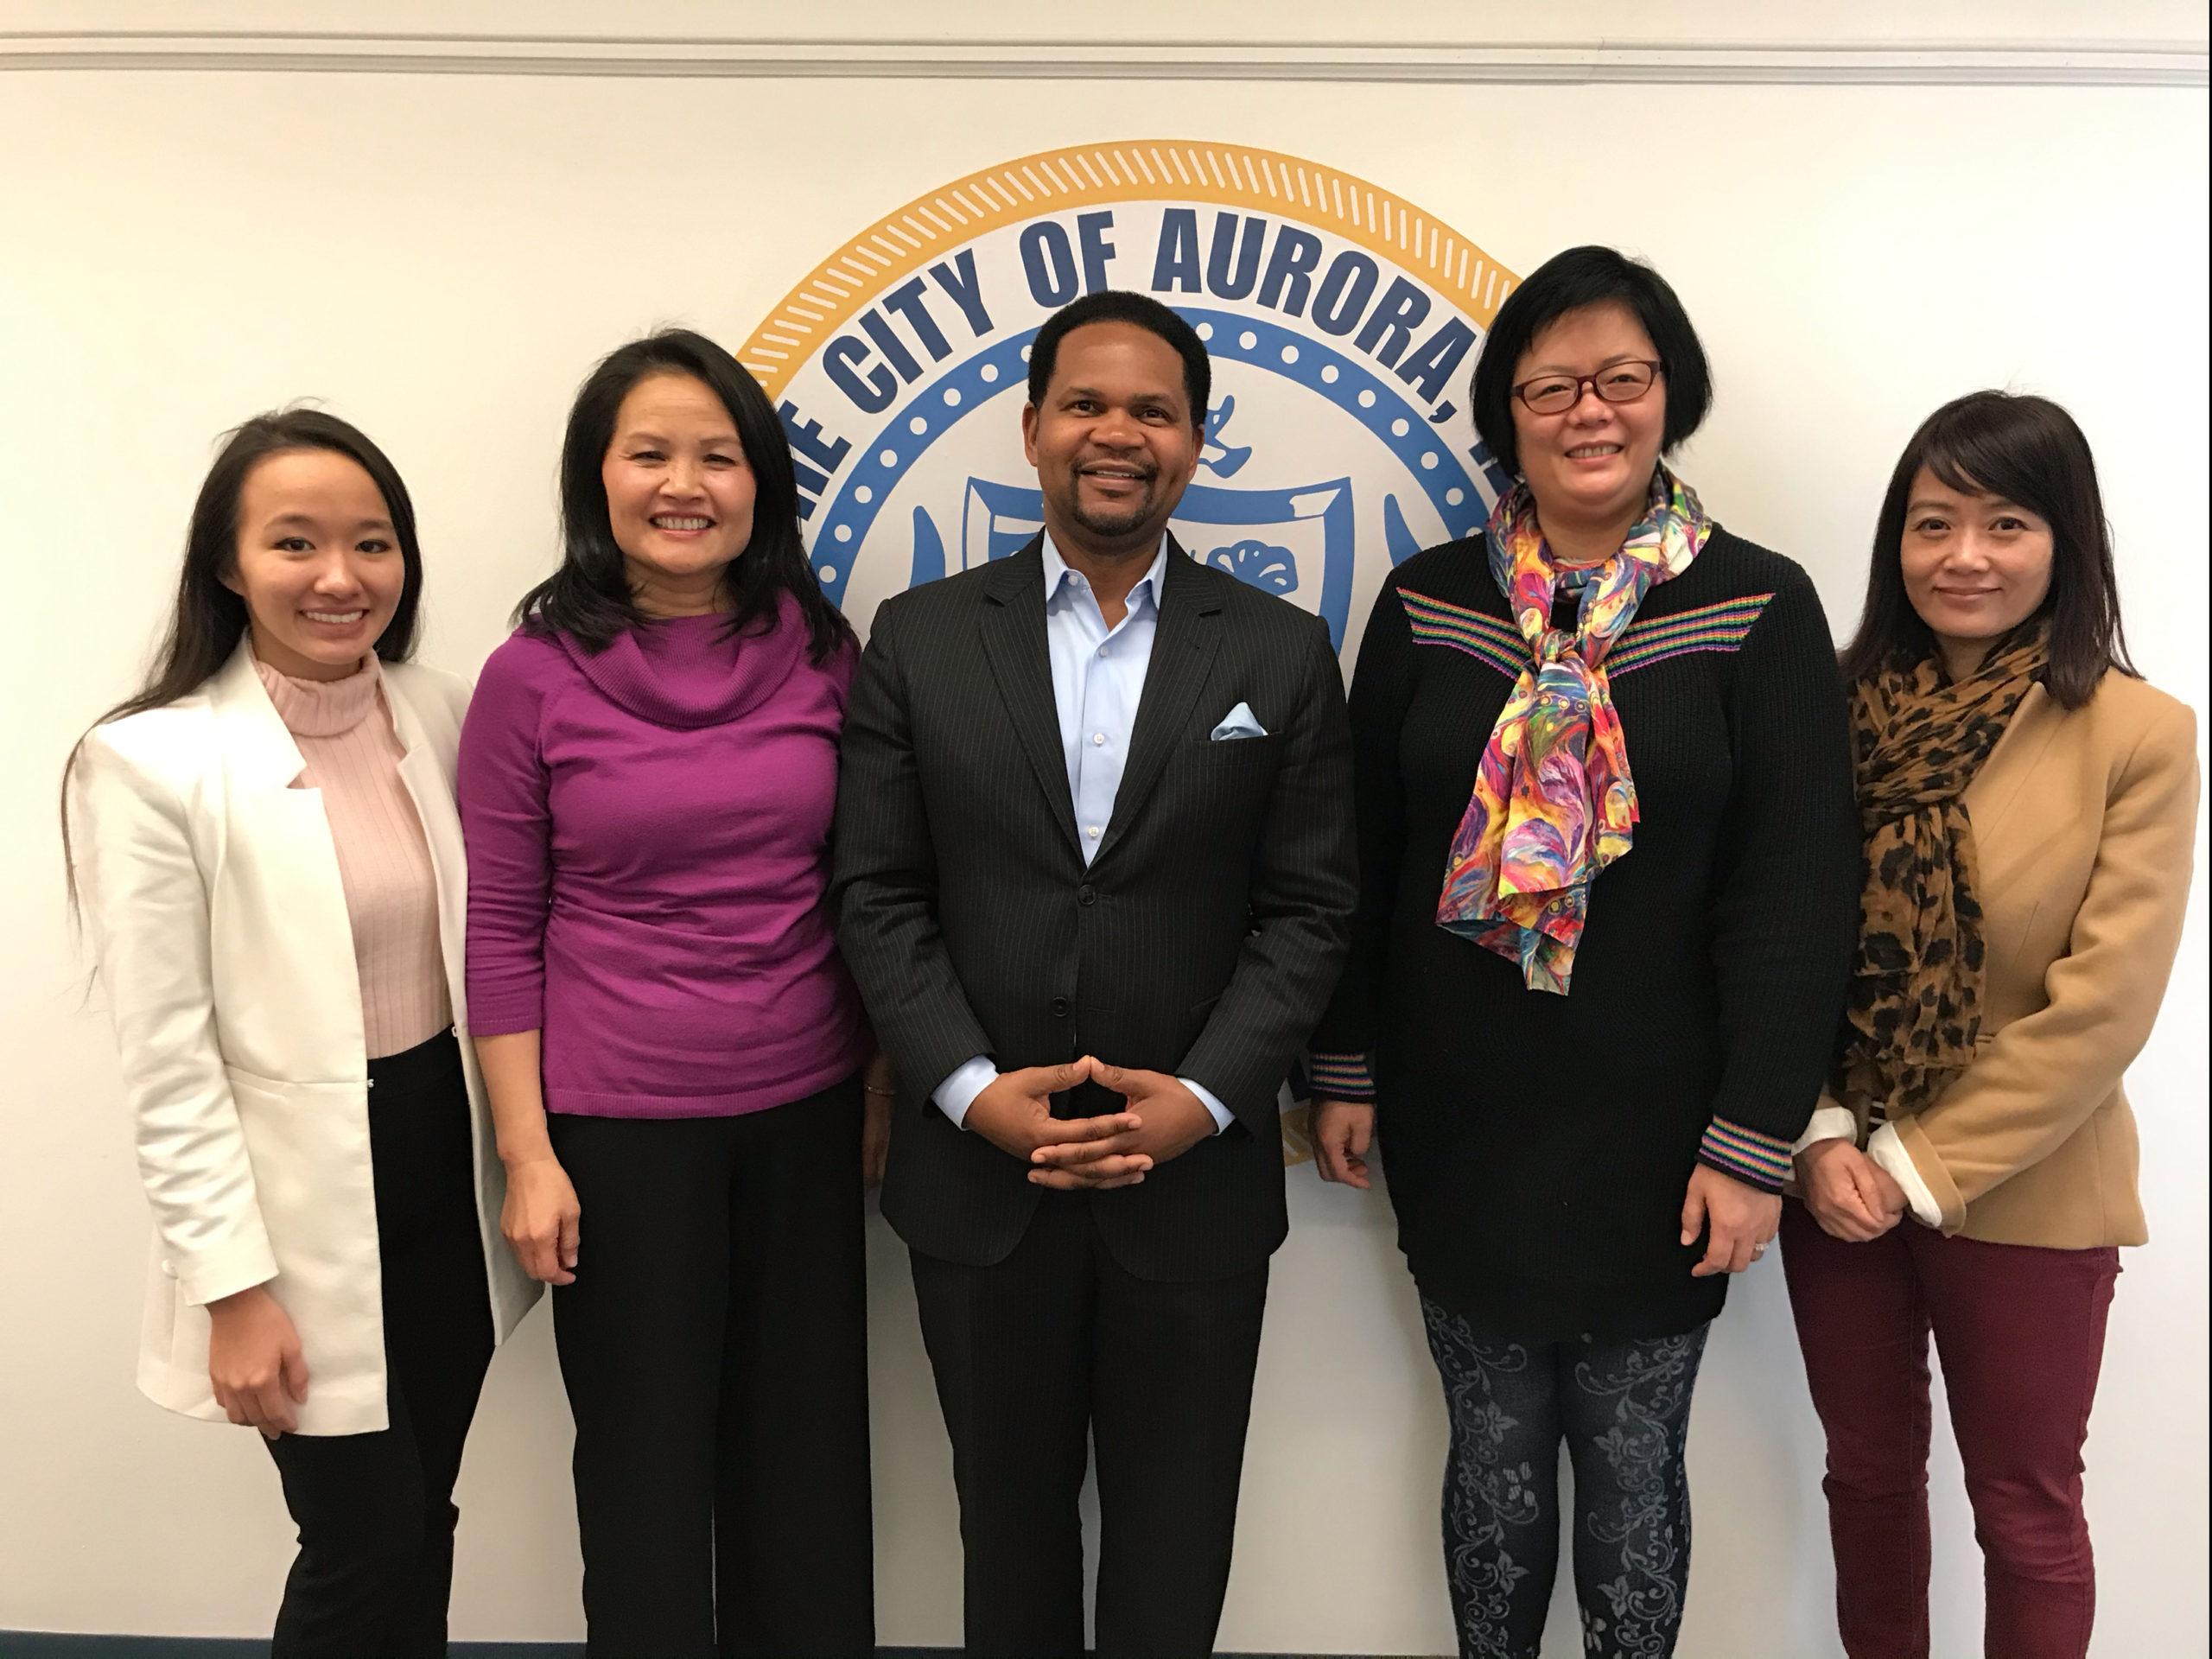 UCA-IL Meeting with City of Aurora Mayor